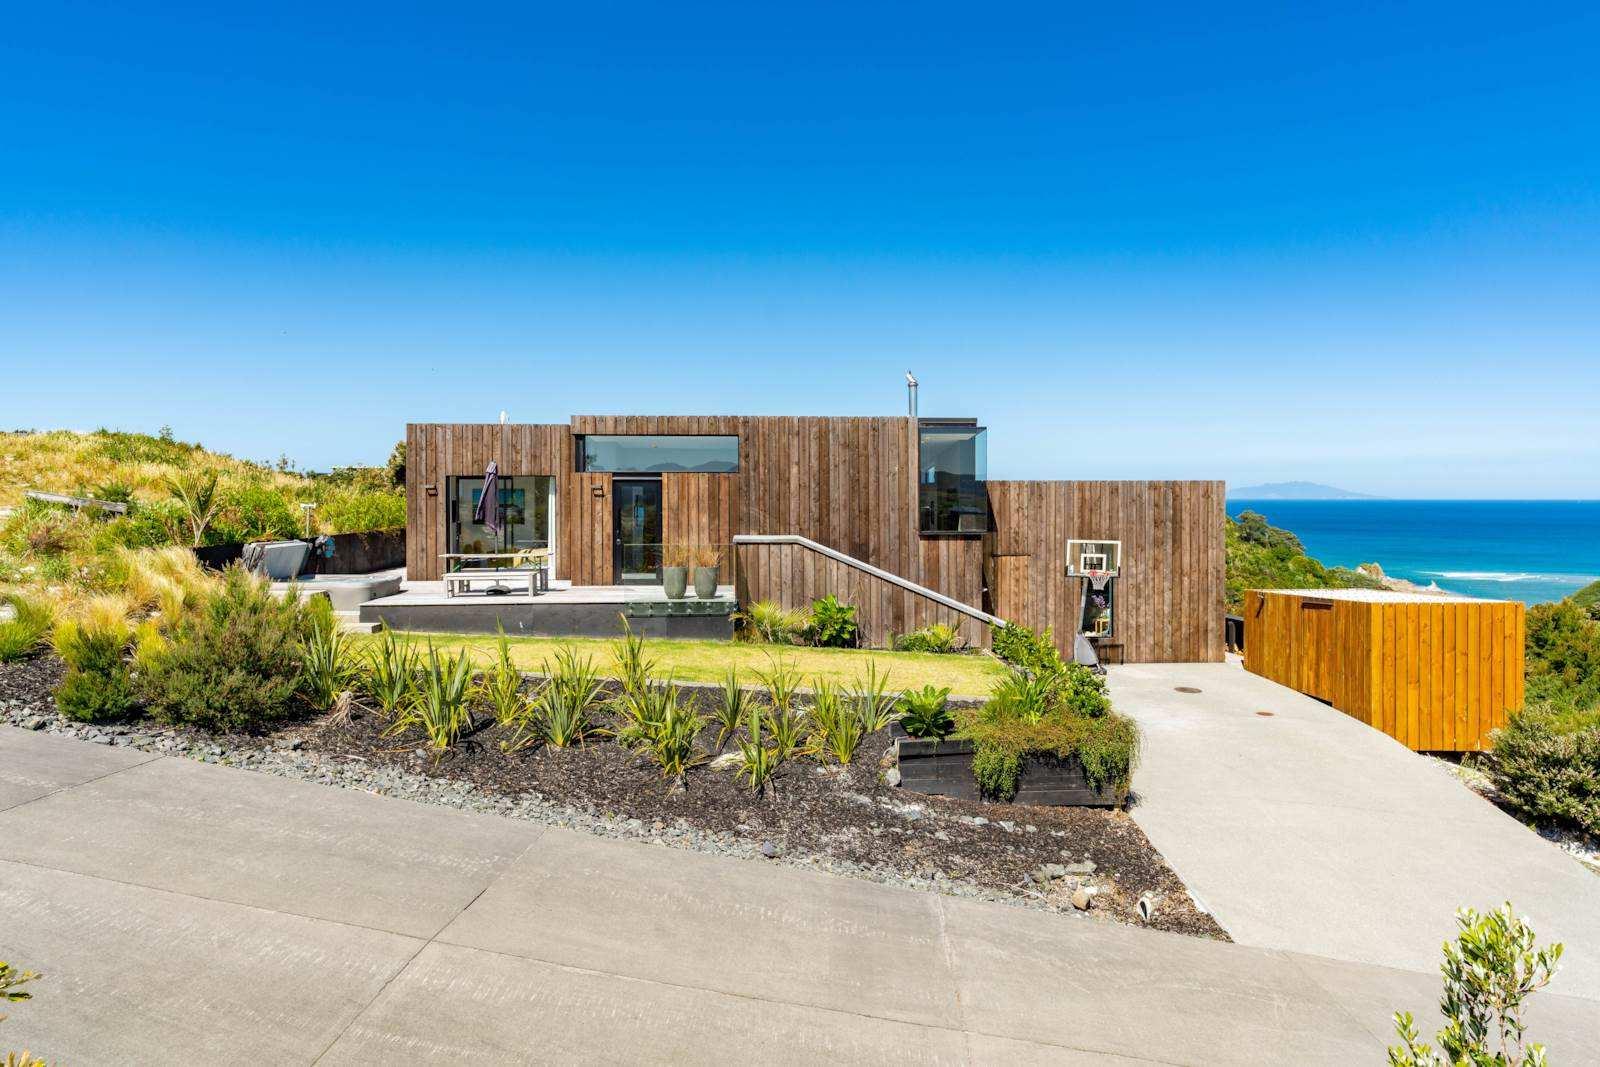 Mangawhai Heads 4房 Coastal Classic, Sensational Views